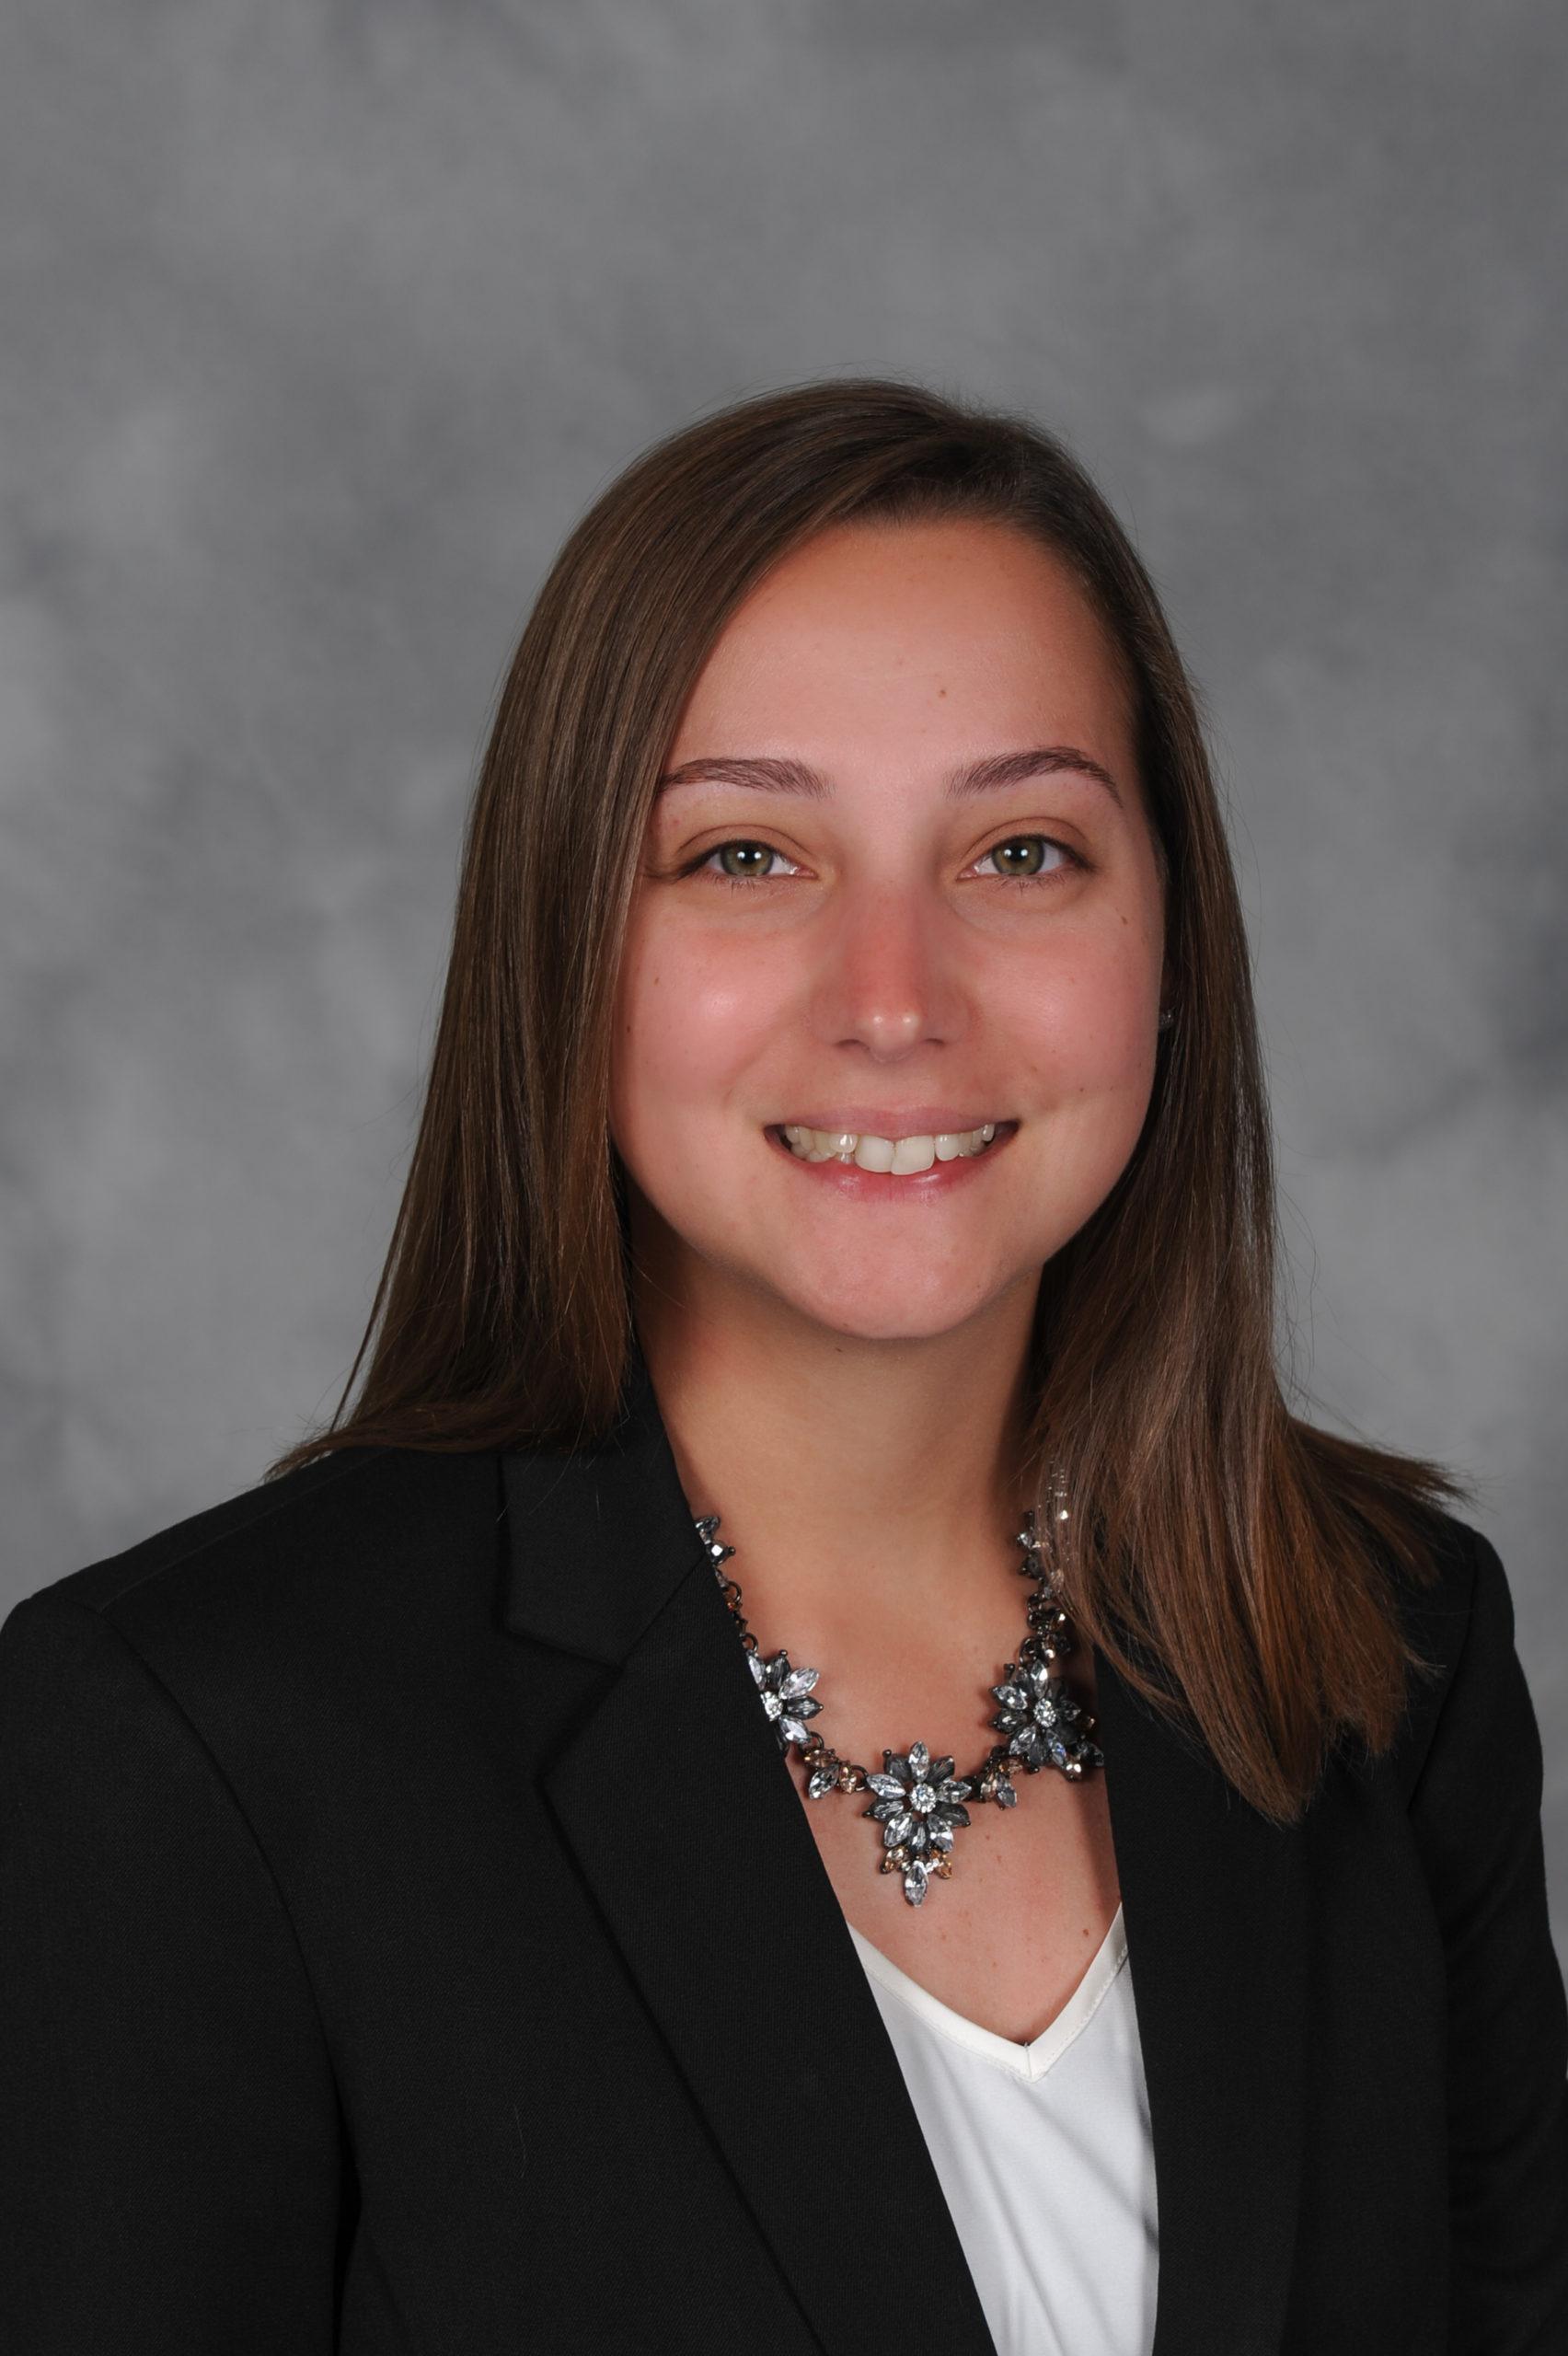 Sarah Mathias-Perry, Human Resources Specialist